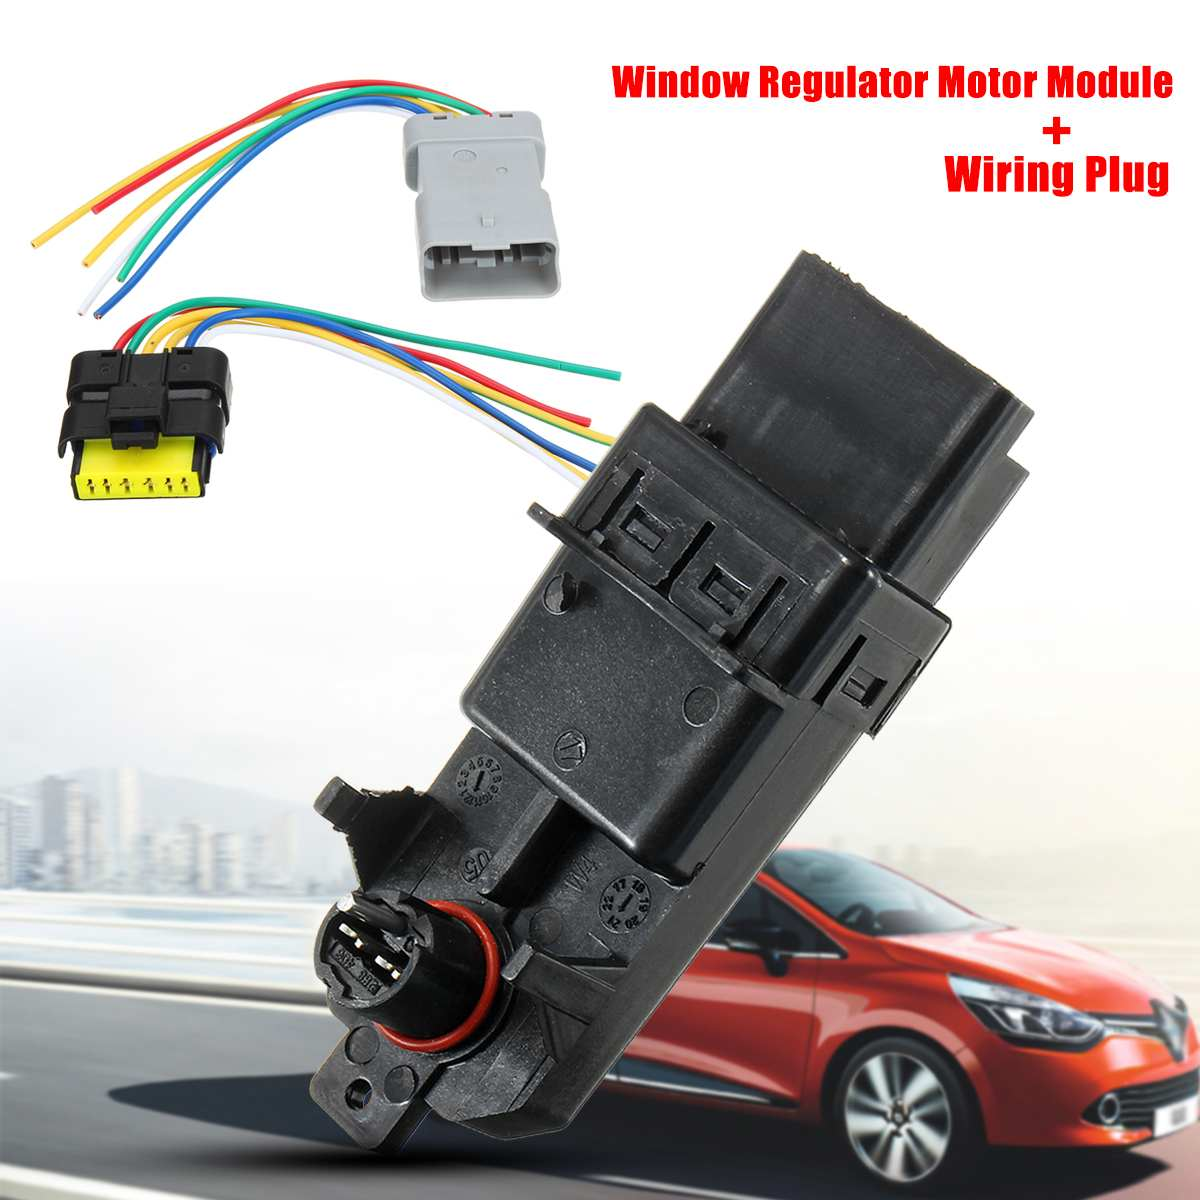 Car Electric Window Lifter Regulator Module Regulator Wiring Plug Harness For Renault Clio/Espace/Grand Scenic/Megane/Scenic